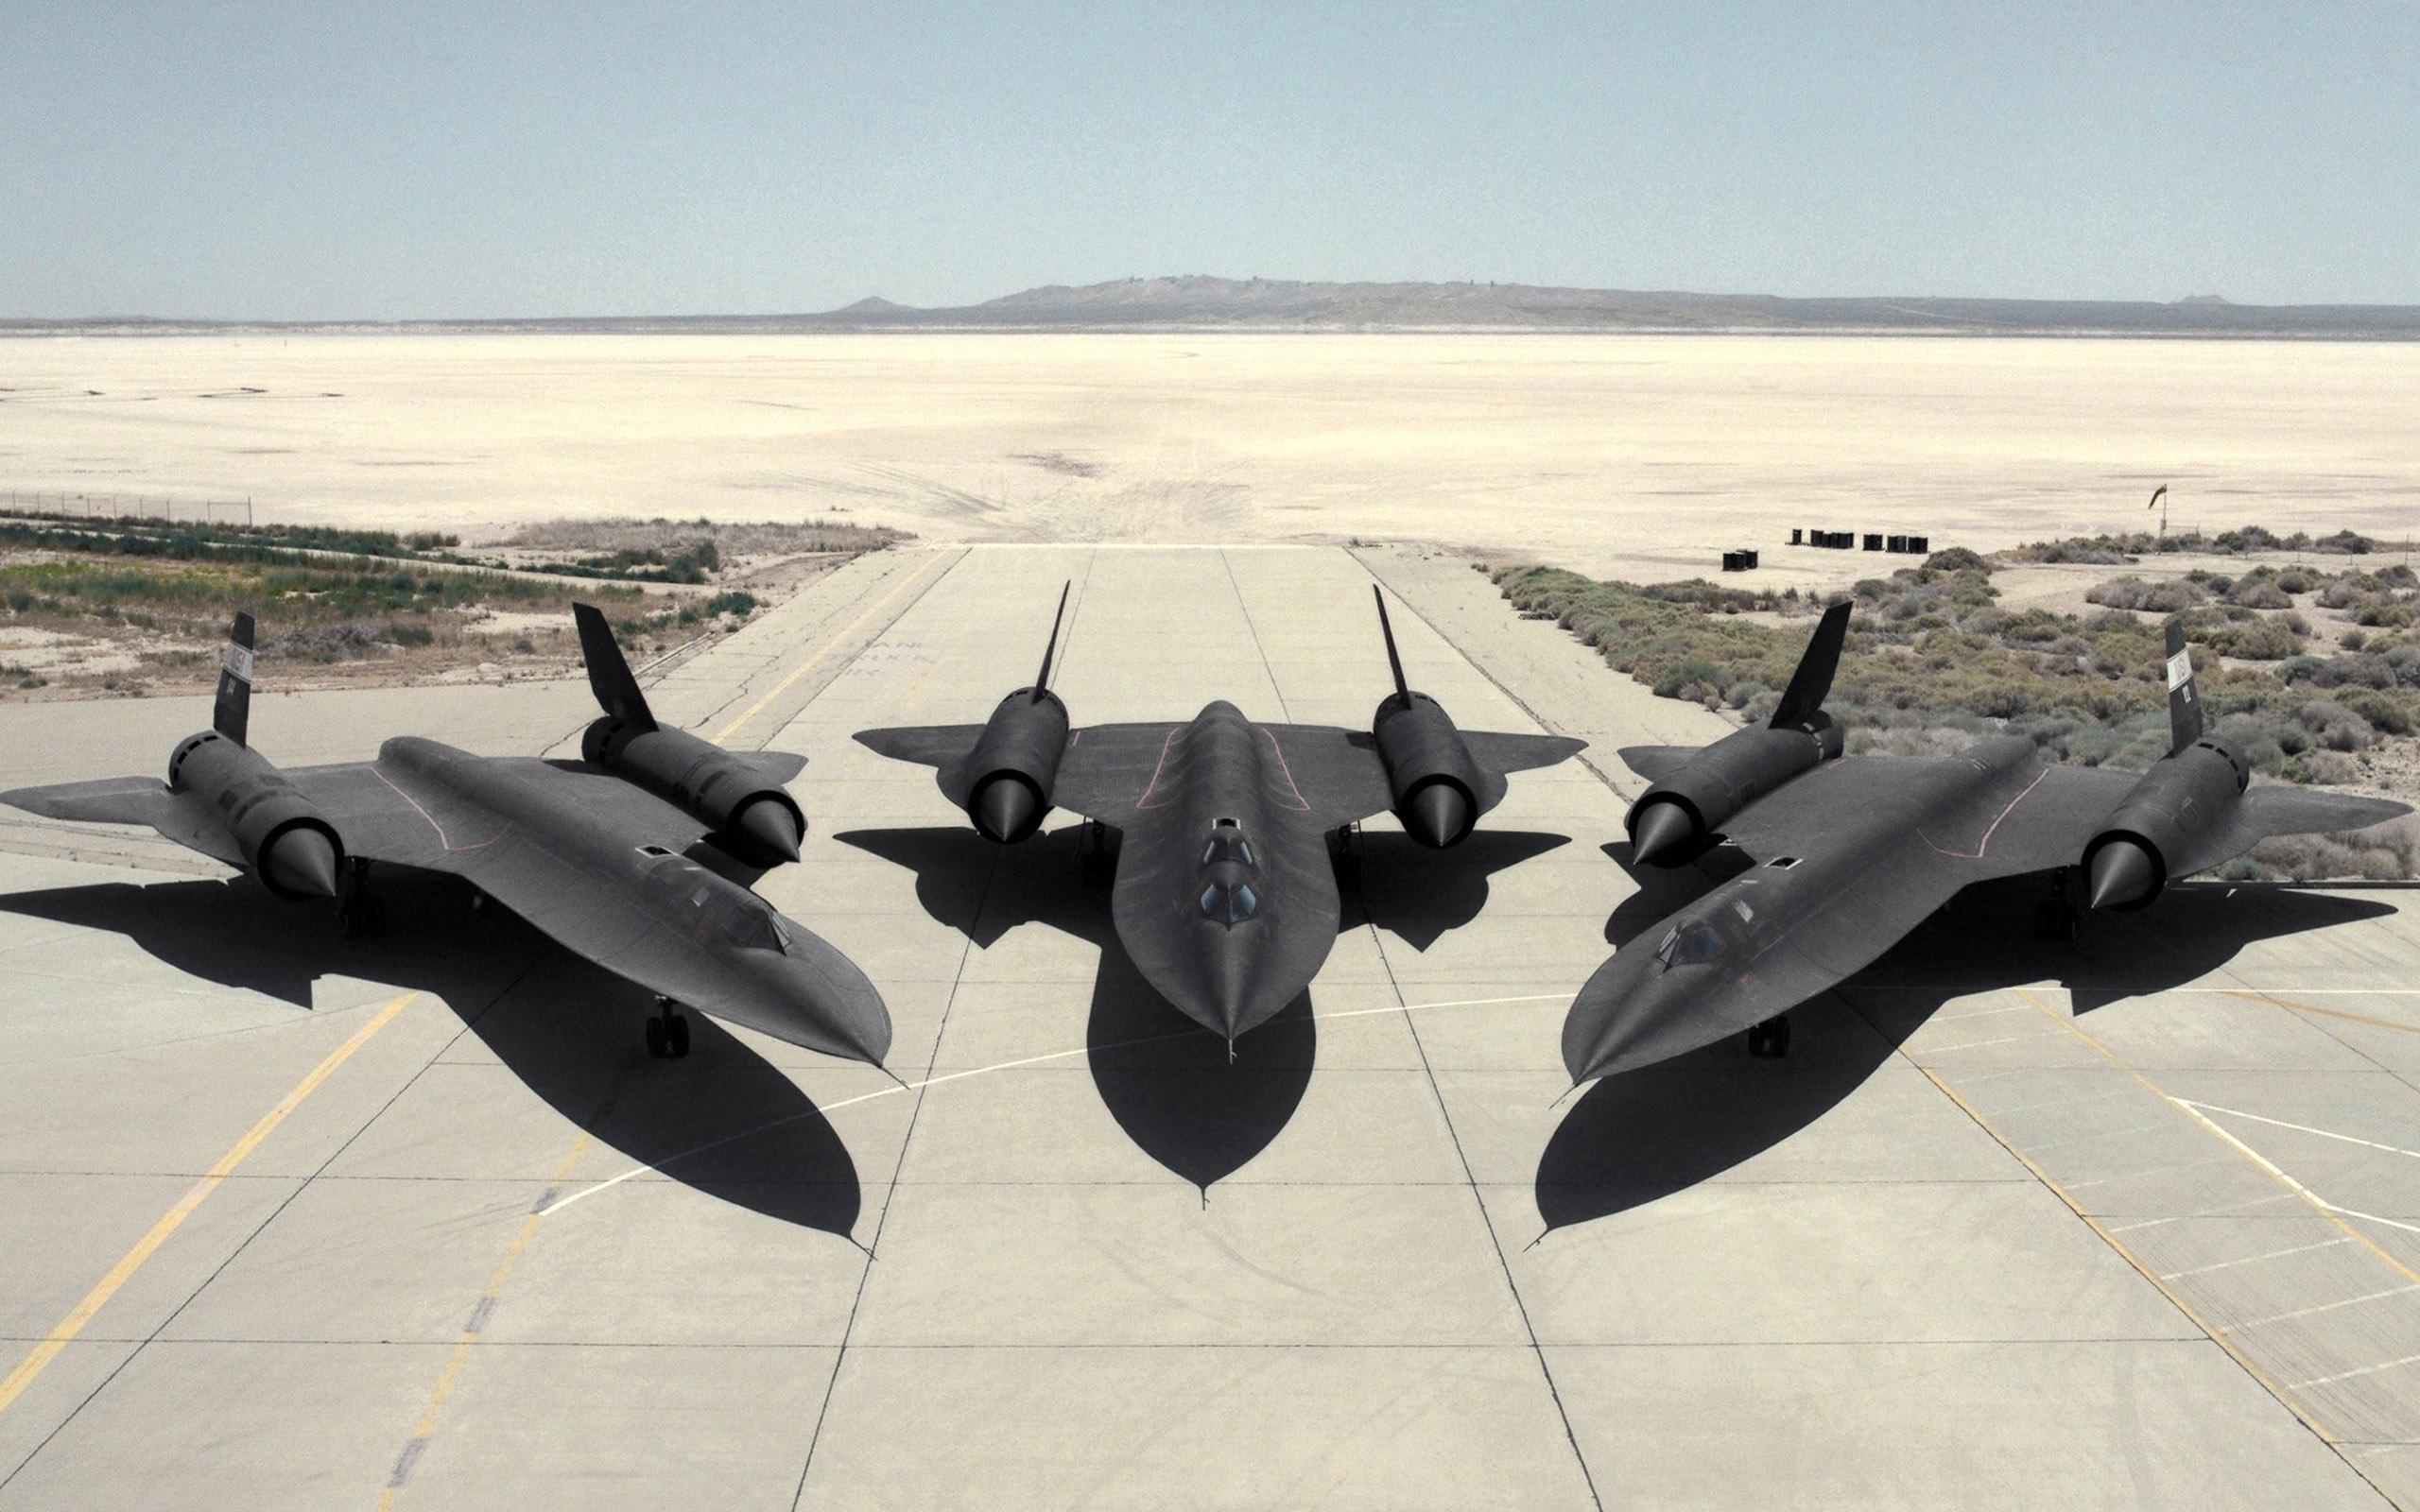 441 best Lockheed SR-71 Blackbird images on Pinterest | Military ...